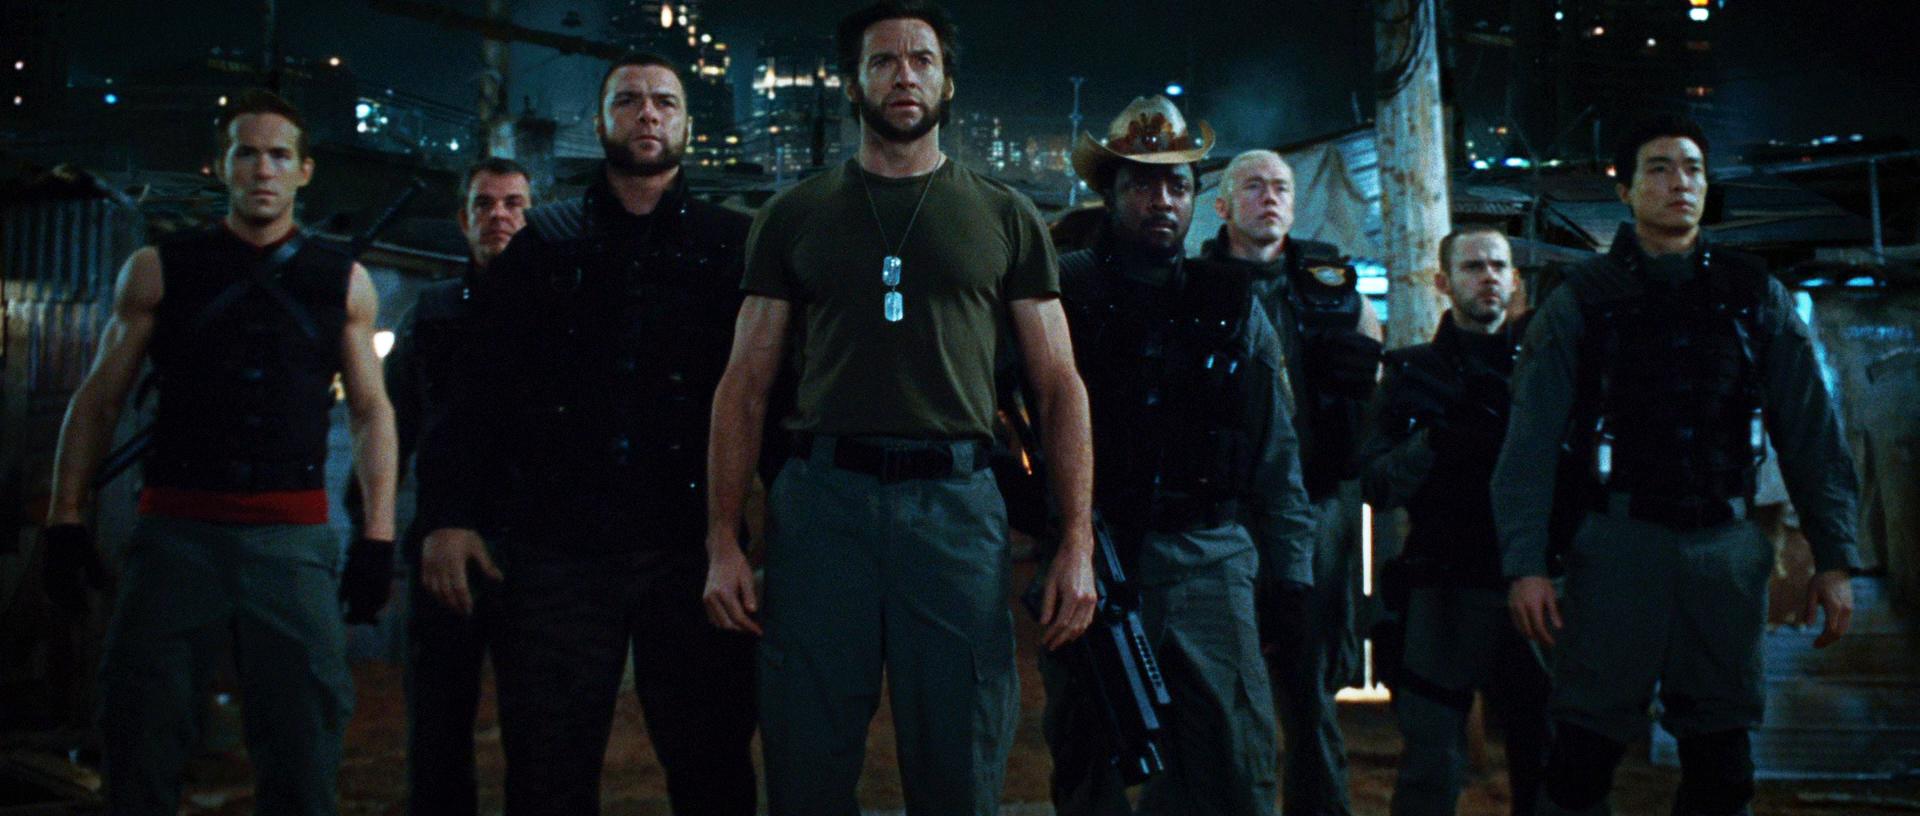 ea4ff04ef0d Team X | X-Men Movies Wiki | FANDOM powered by Wikia